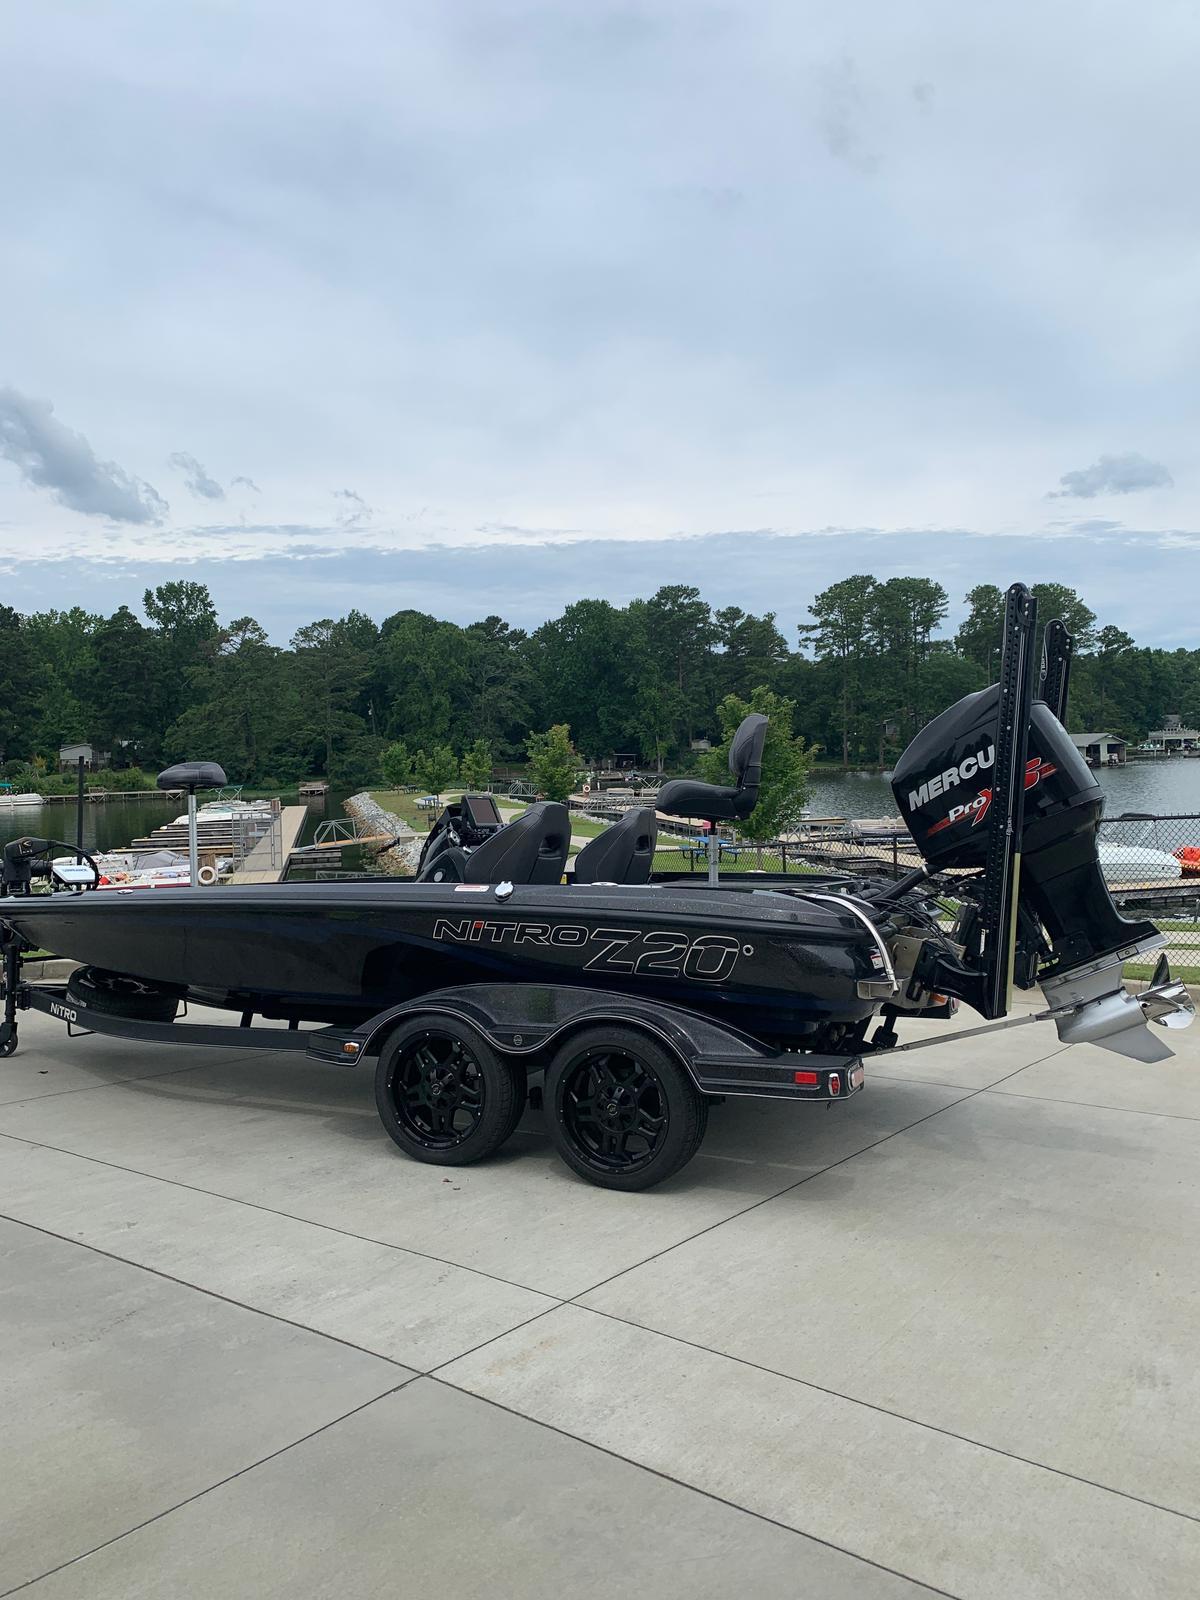 2018 Nitro boat for sale, model of the boat is Z20 & Image # 28 of 32